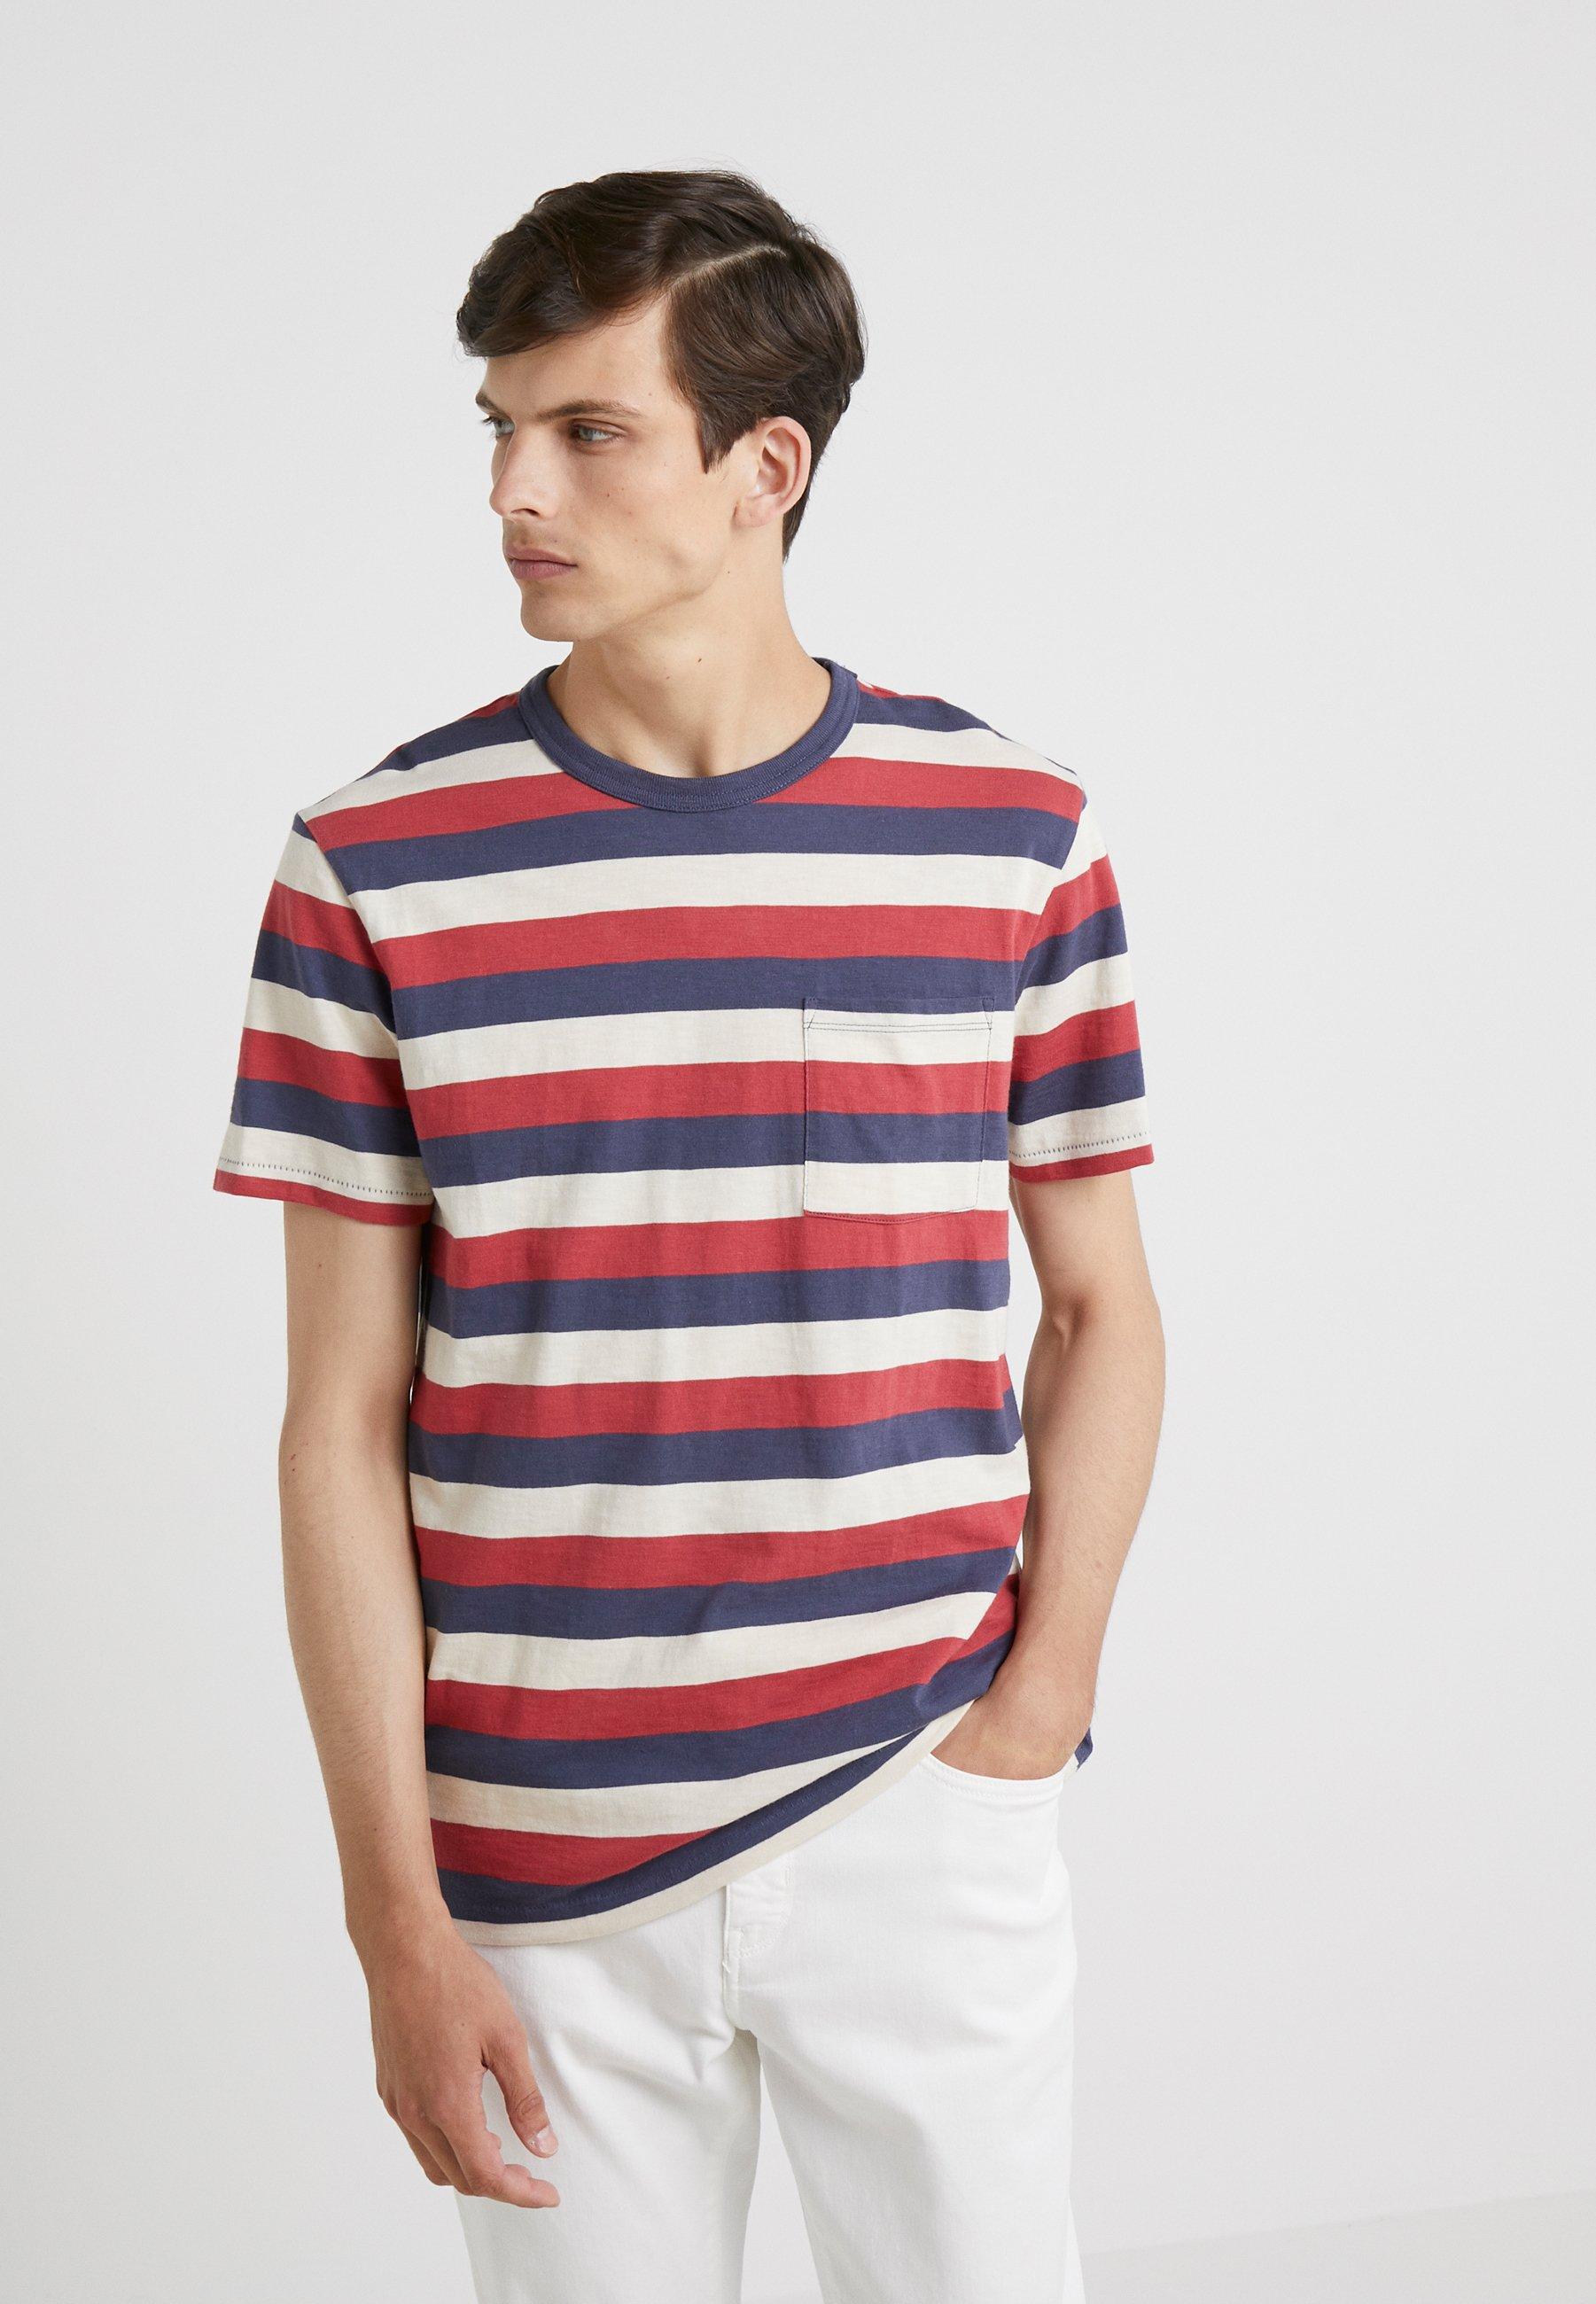 crew Stripe Brick shirt J Tour Imprimé Aztec TeeT De eW9DbE2YIH